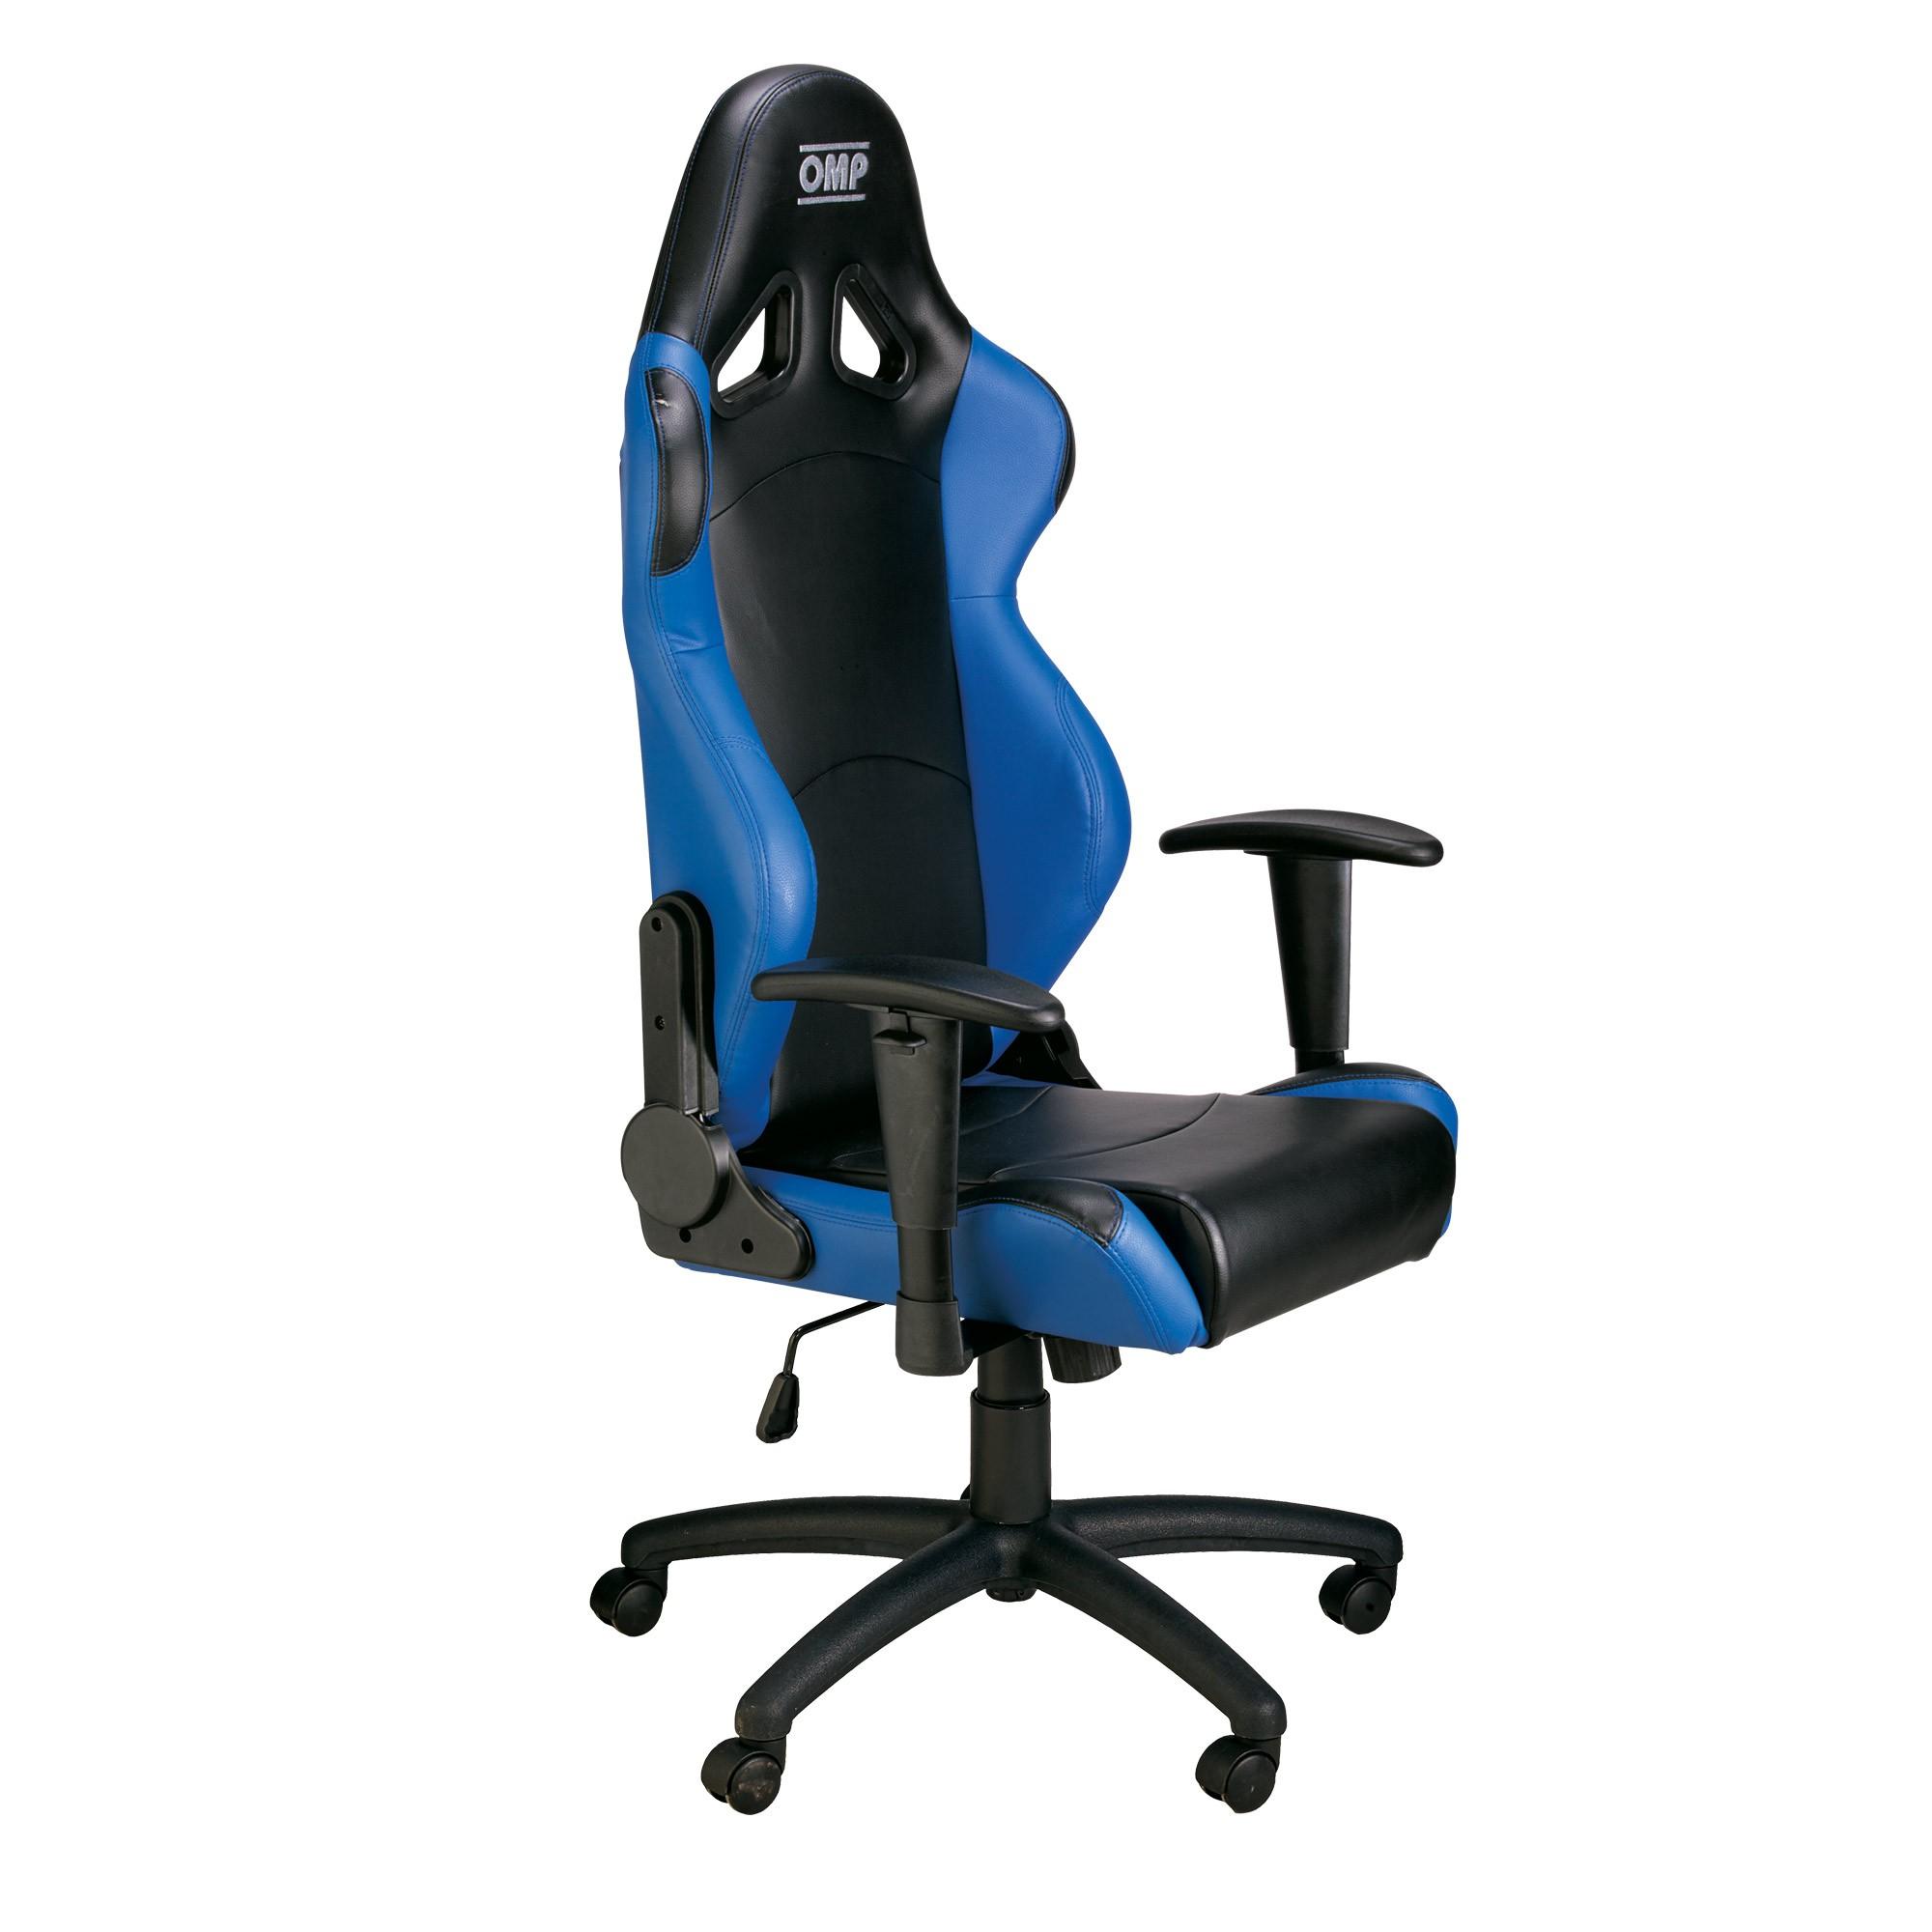 Omp chair sedia da ufficio racing for Sedia omp